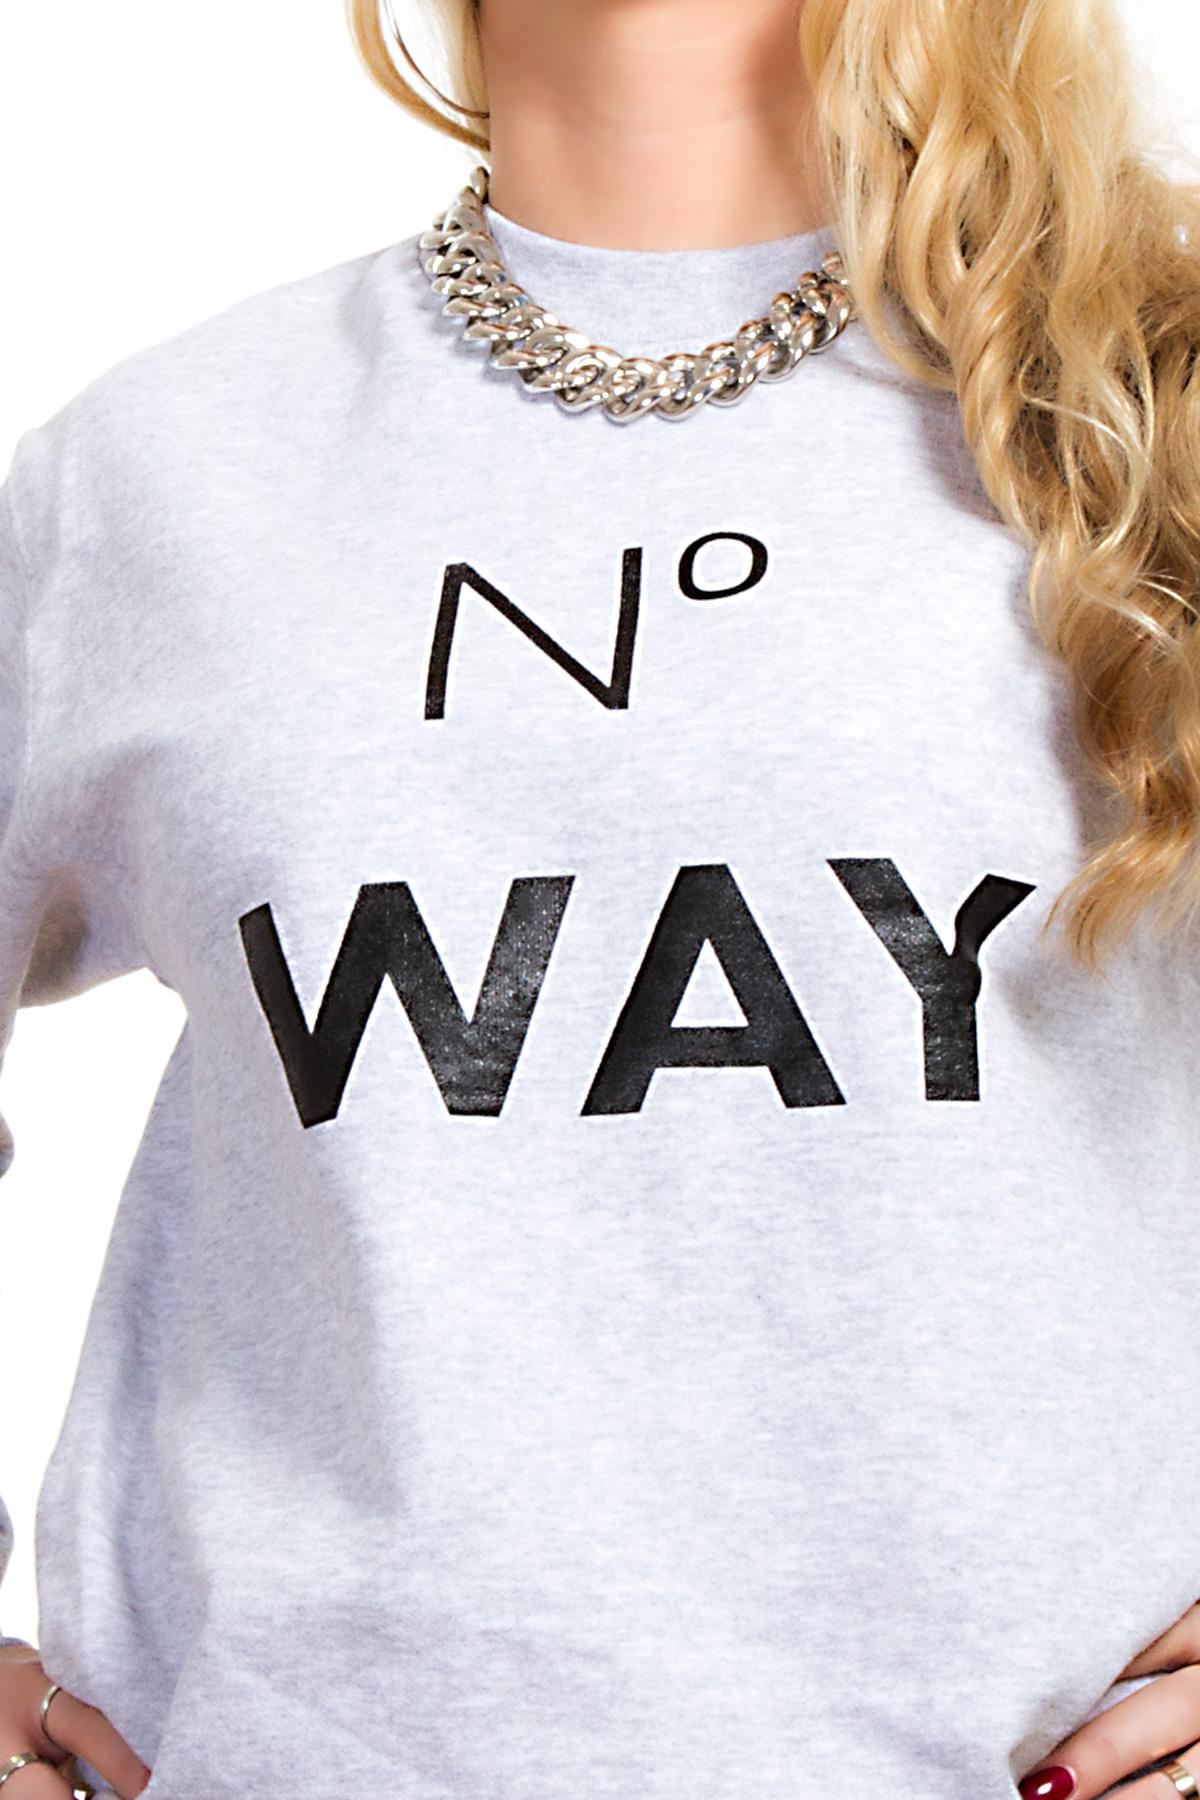 Hyori No Way Sweatshirt in Grau für Damen